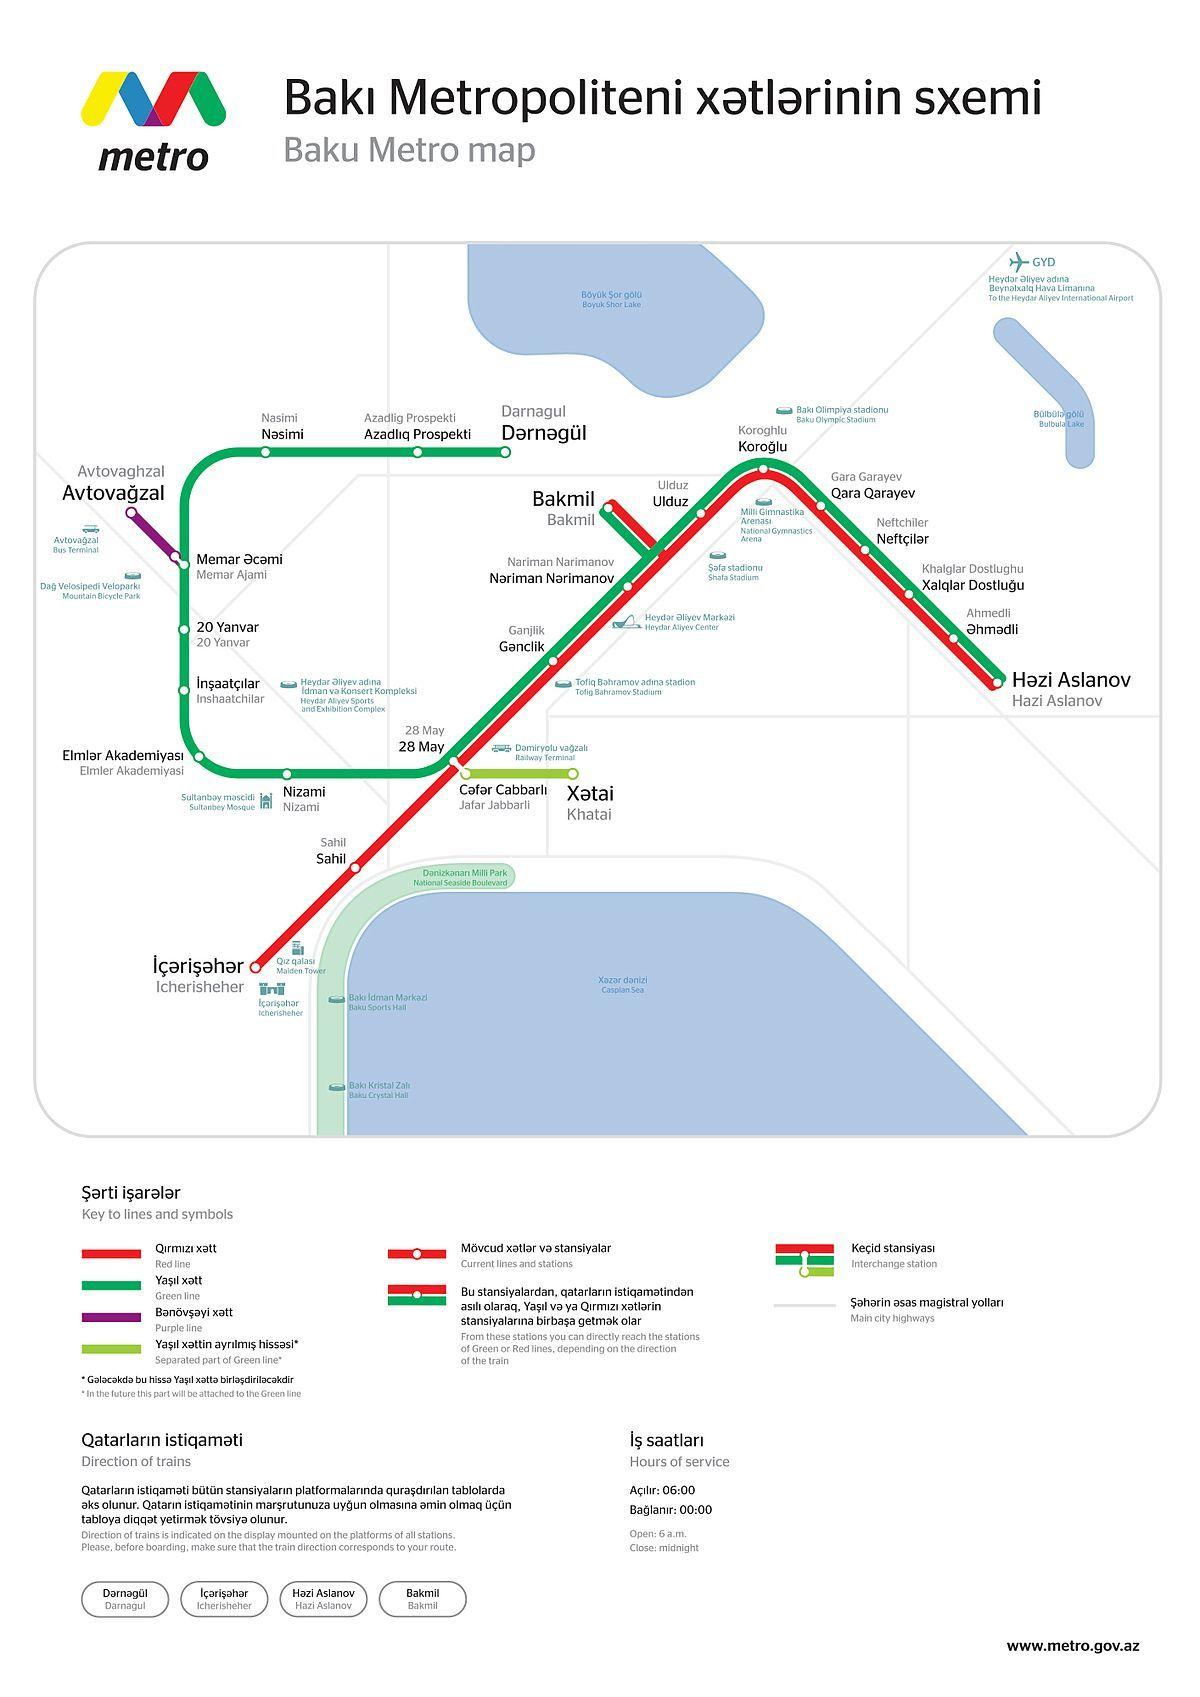 Subway Map Baseball.Saratov Forex Club Llcc Baseball Nombdunrei Map Bus Map Rapid